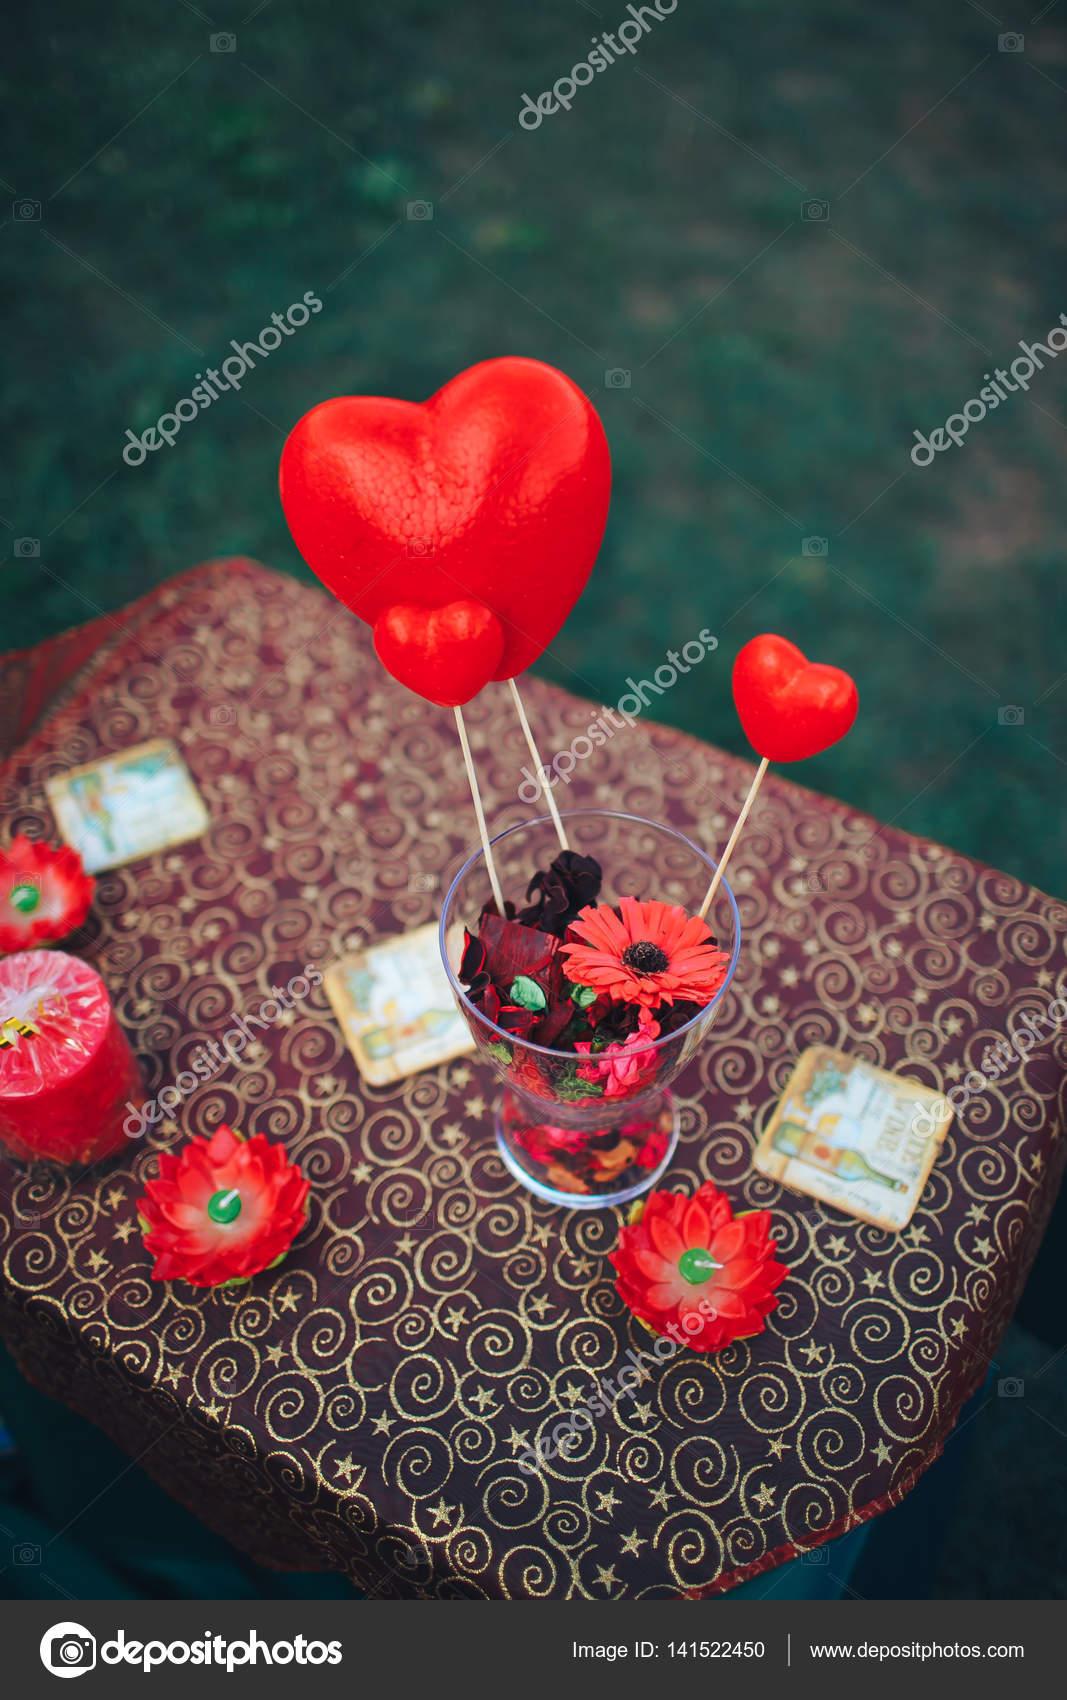 Historia De Decorlove De Dia De San Valentin Decoracion De Mesa - Cena-romantica-decoracion